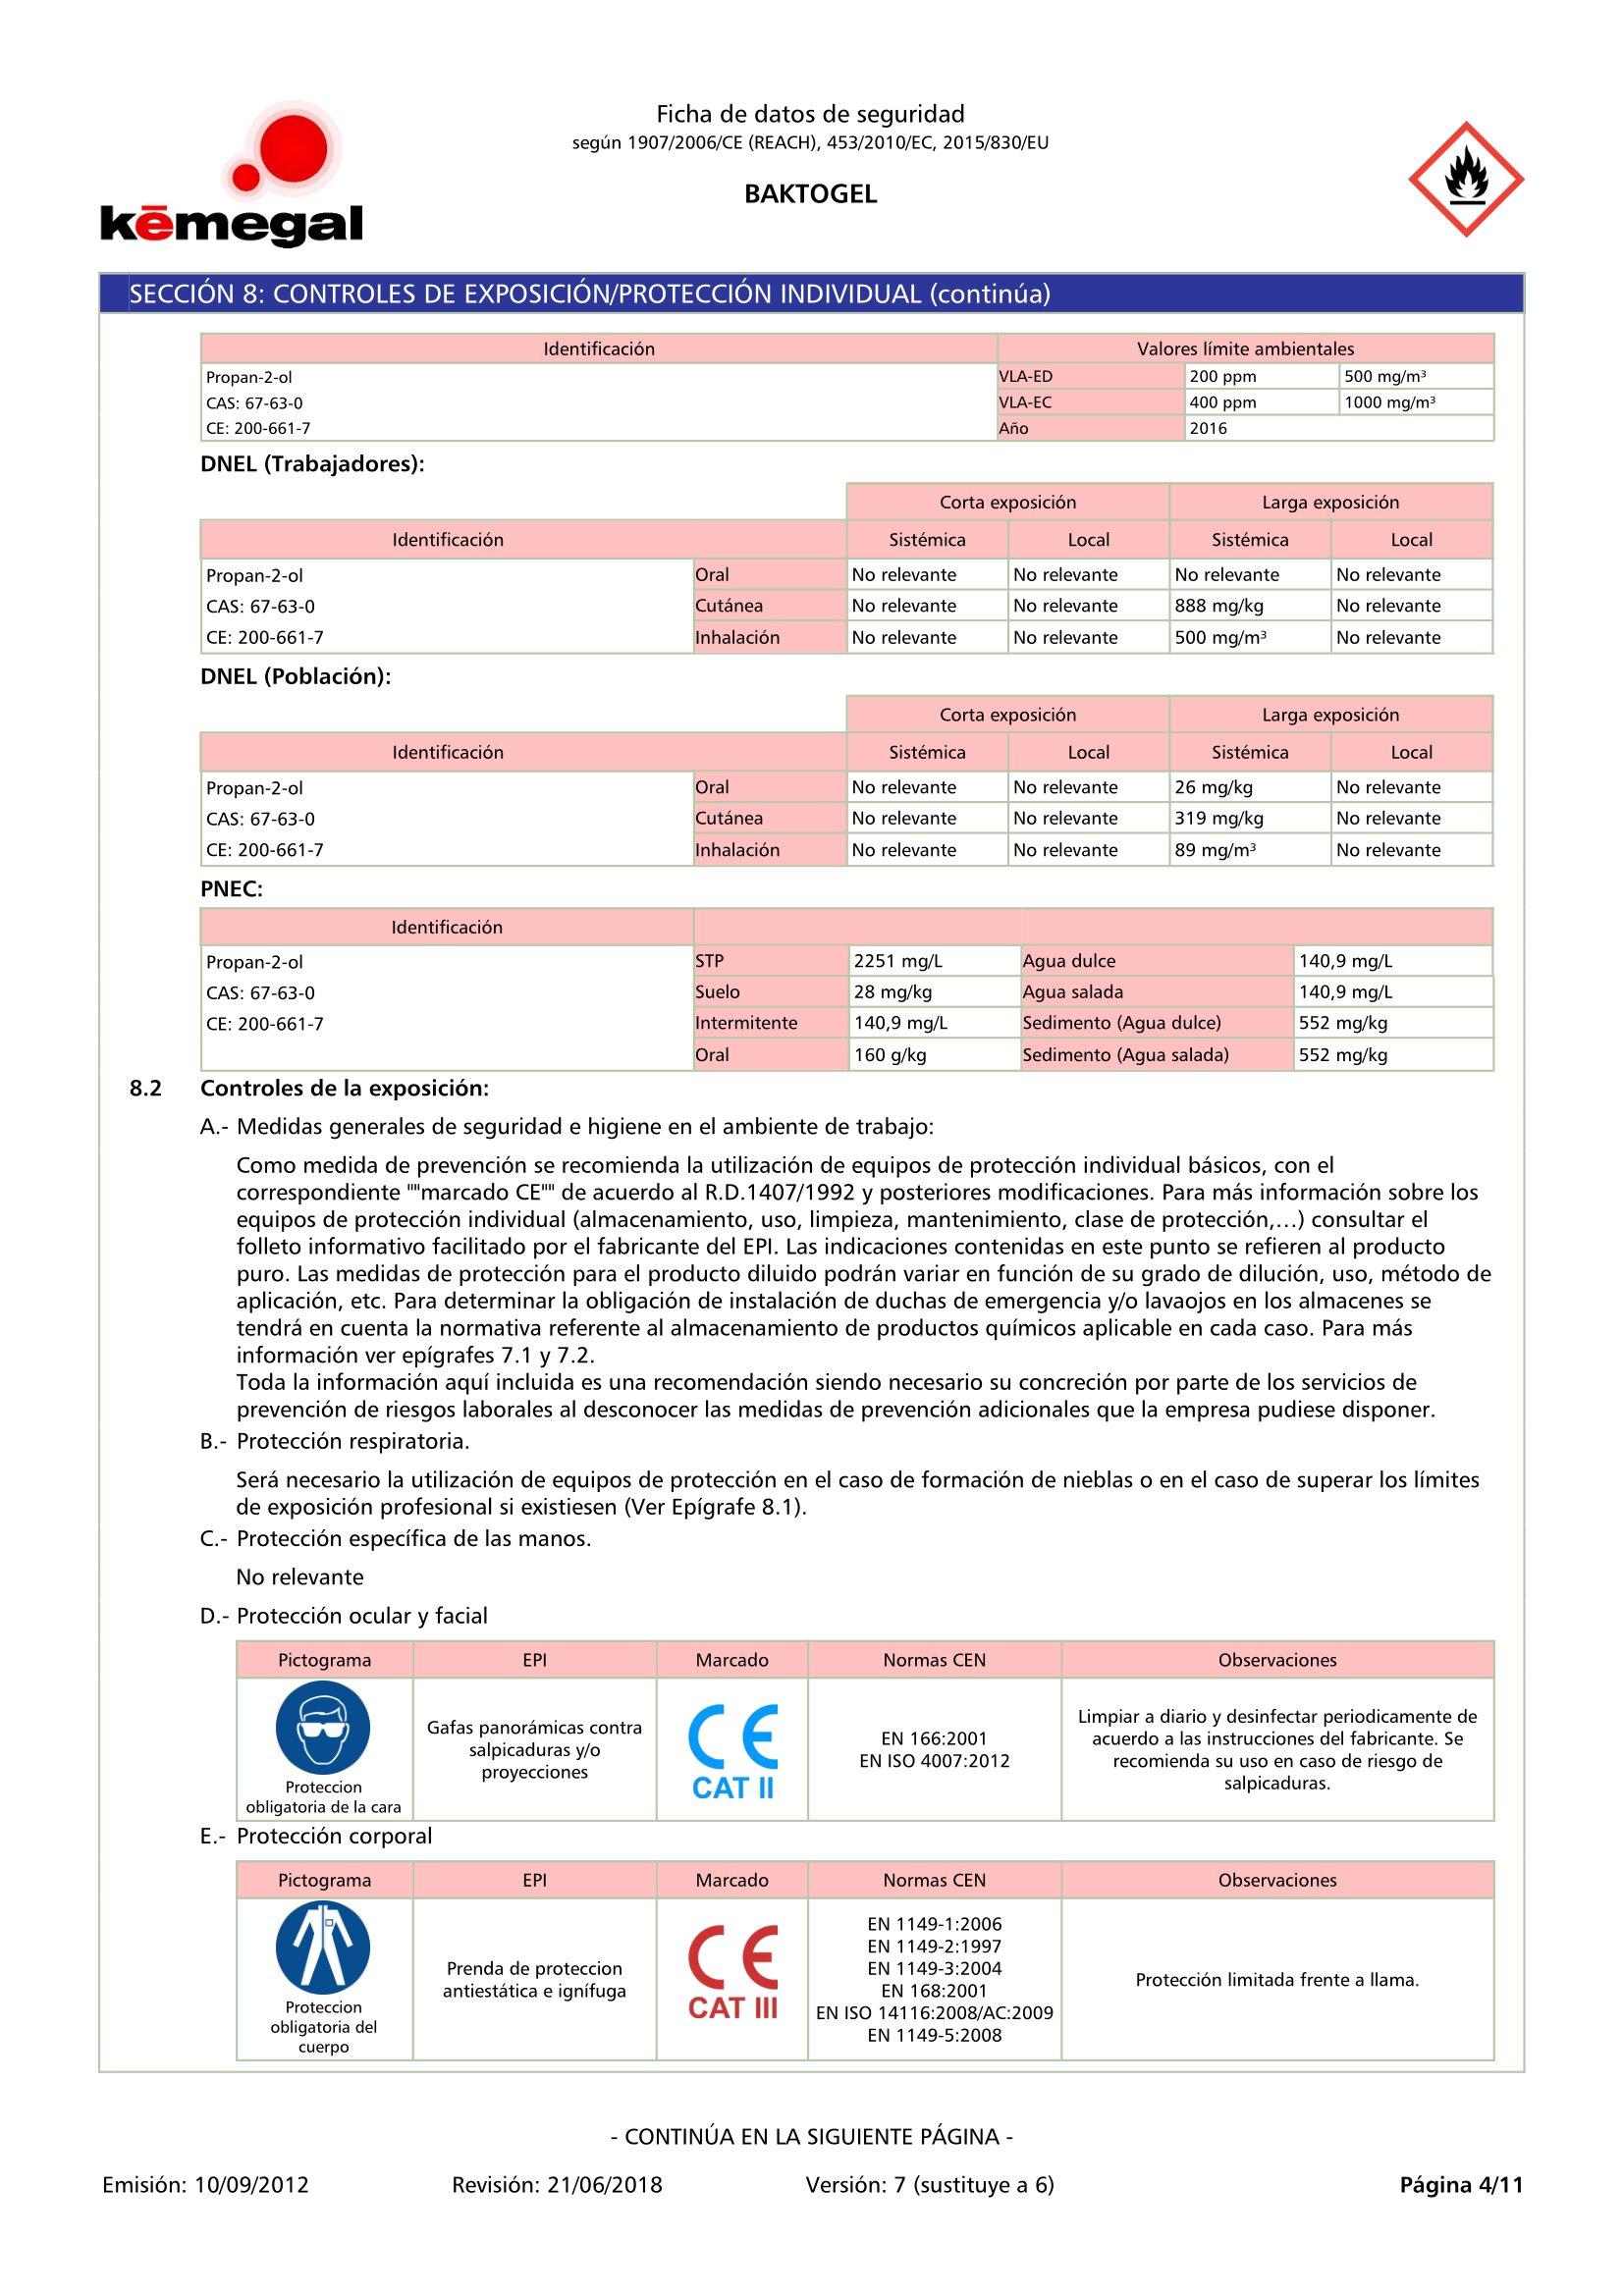 SAFIR FISIOTERAPIA CORUA BAKTOGEL_0004jpg